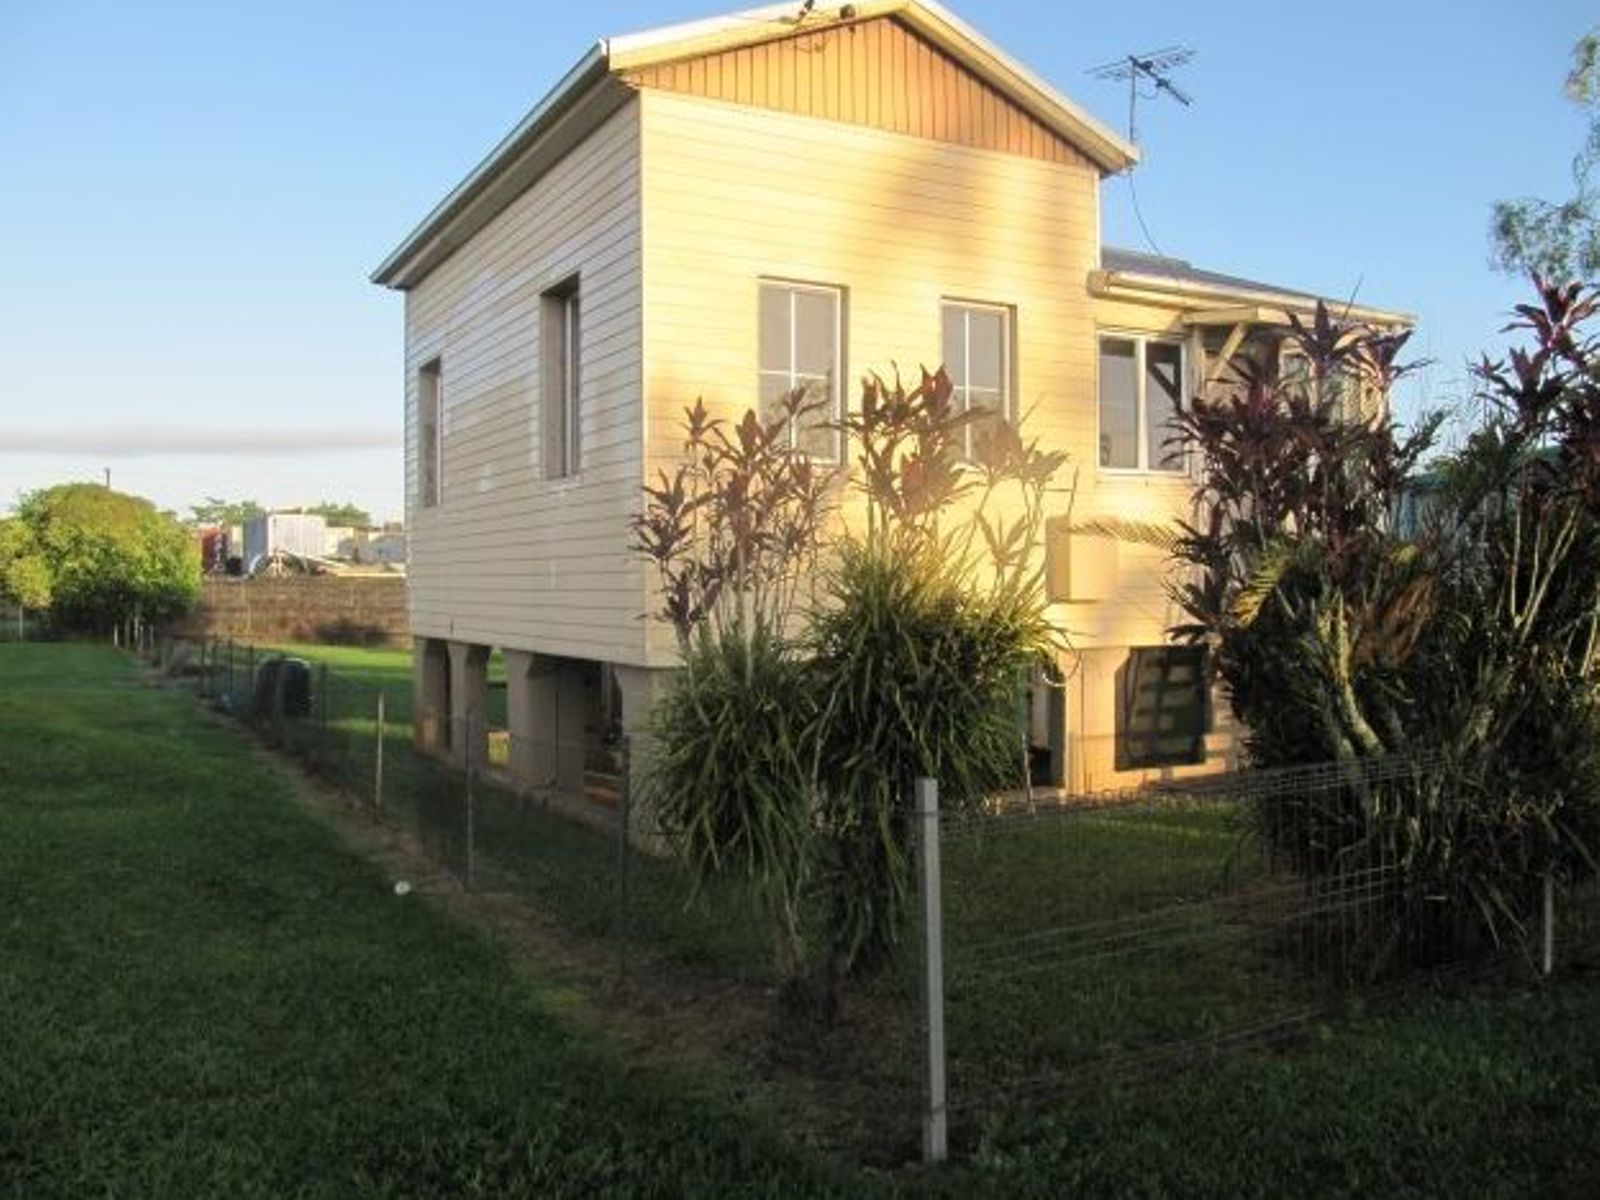 12 Charles Street, Innisfail, QLD 4860